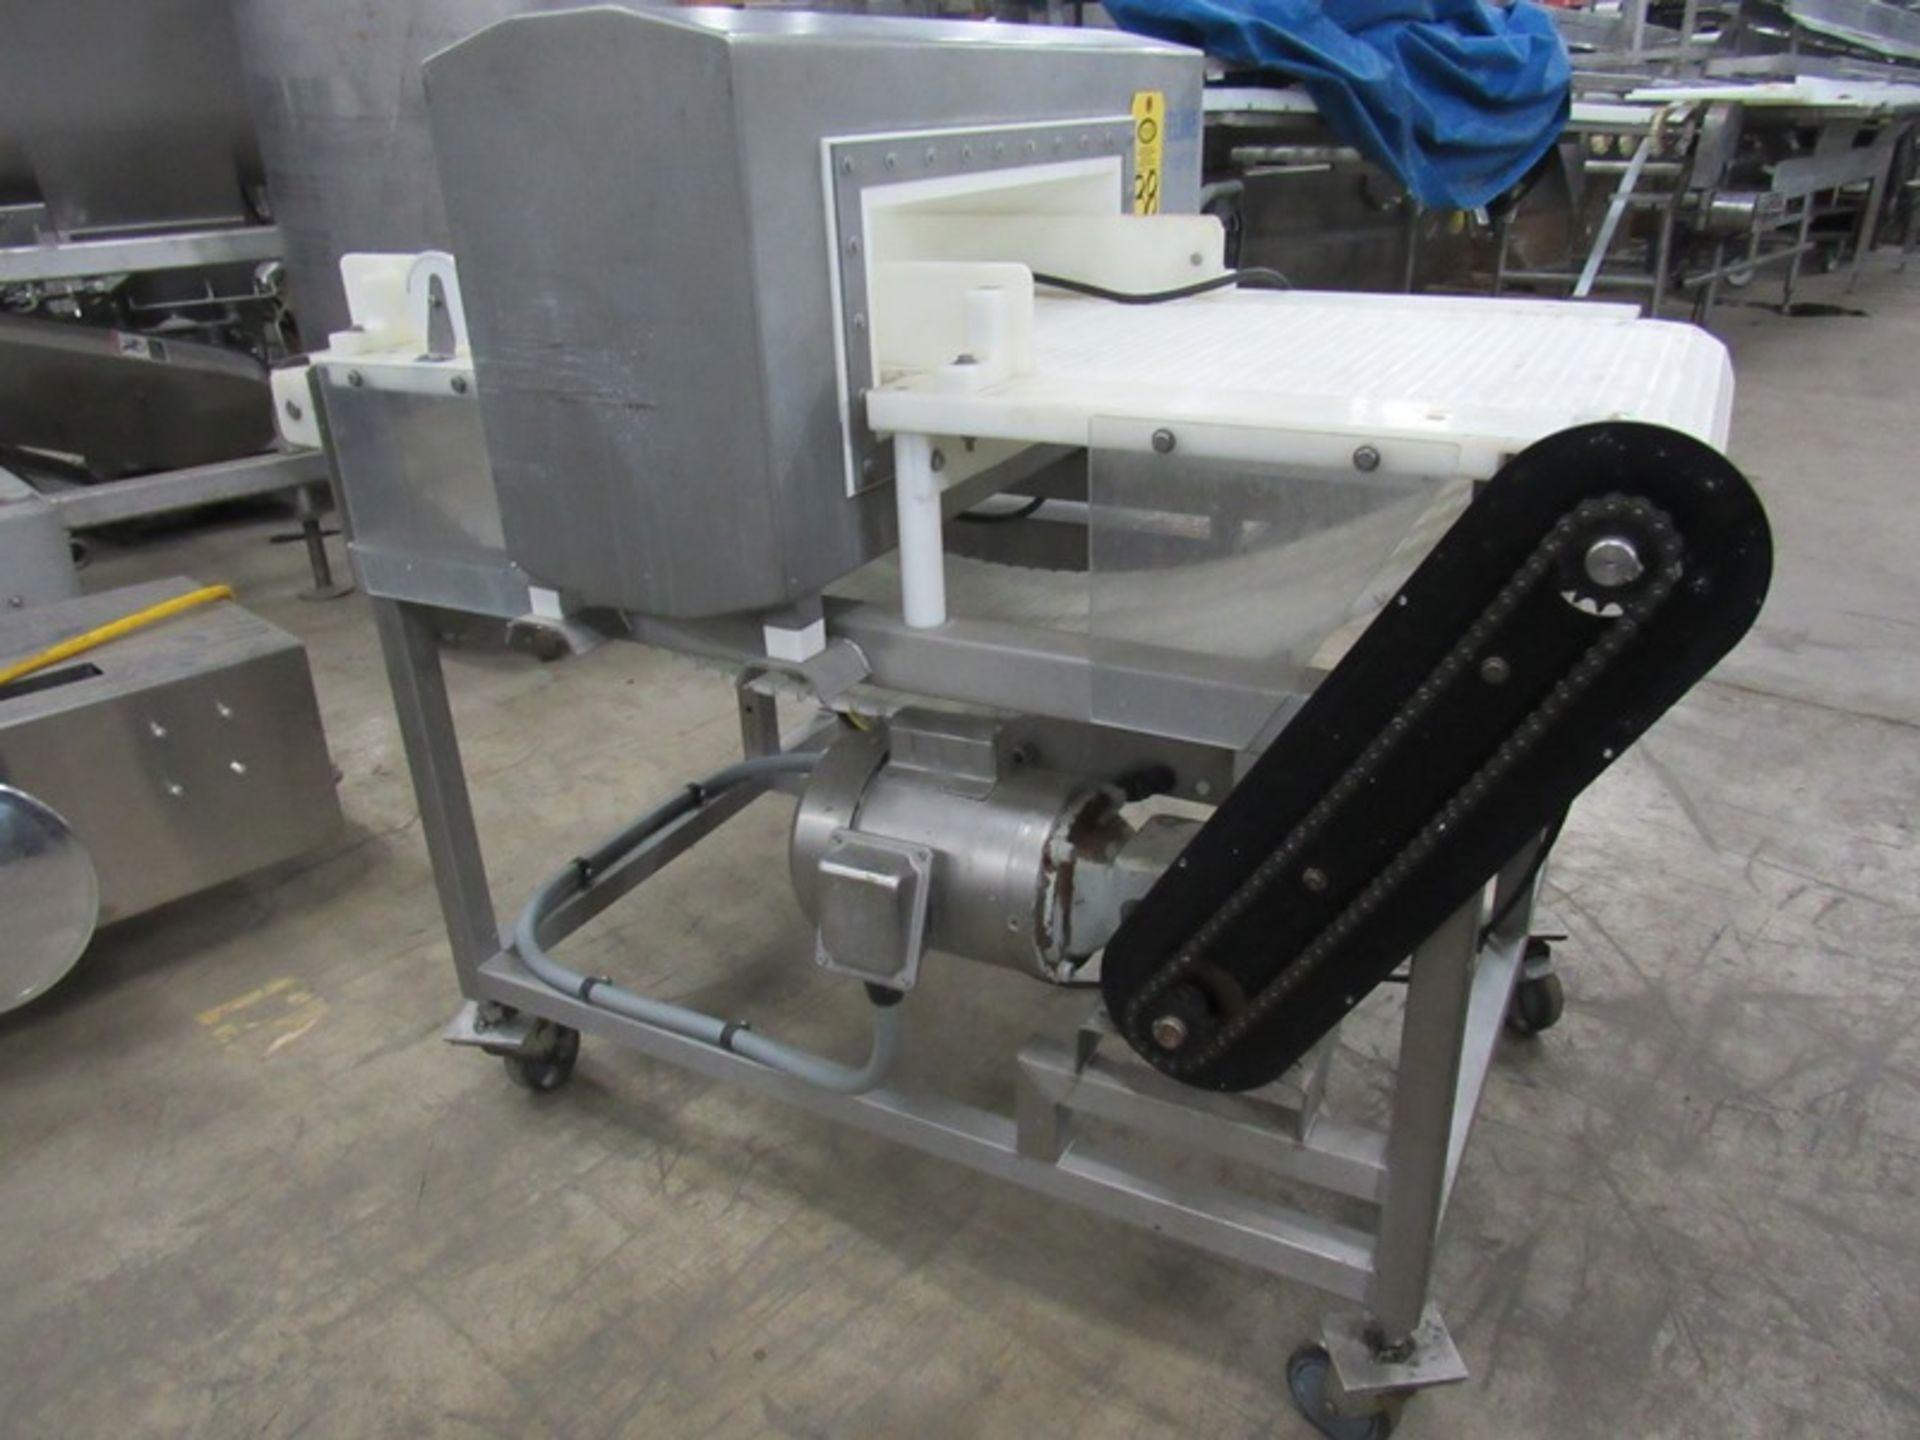 "Lot 38 - Safeline Mdl. 1/3/R/100 300 Stainless Steel Metal Detector, 17 3/4"" W X 6' T apperture, 16"" W X4'"